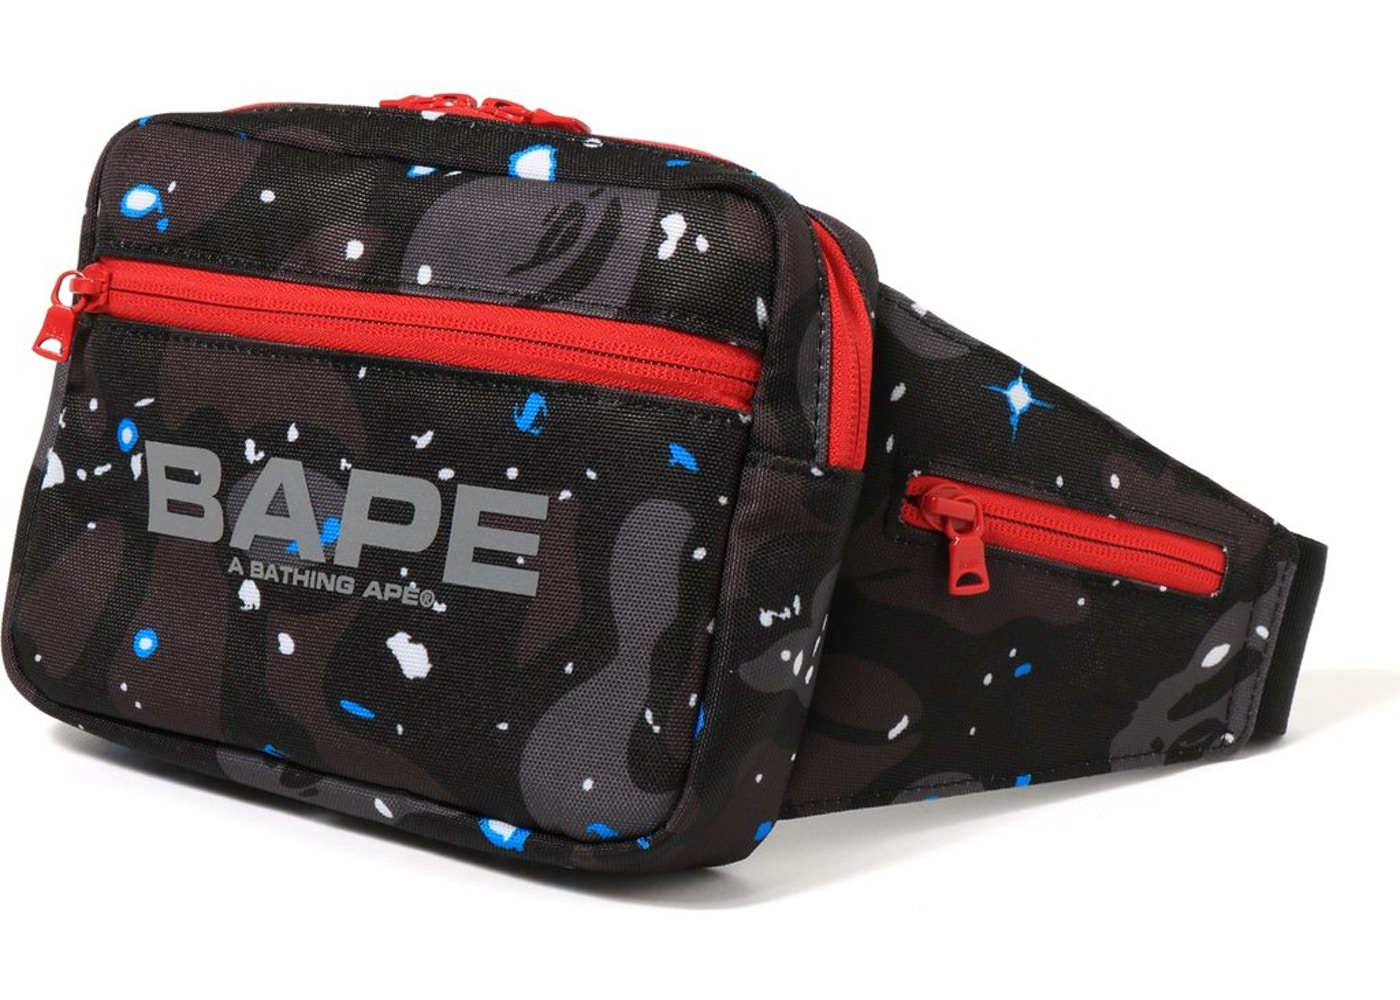 Bape Bags - Buy   Sell Streetwear 187f8a82ef